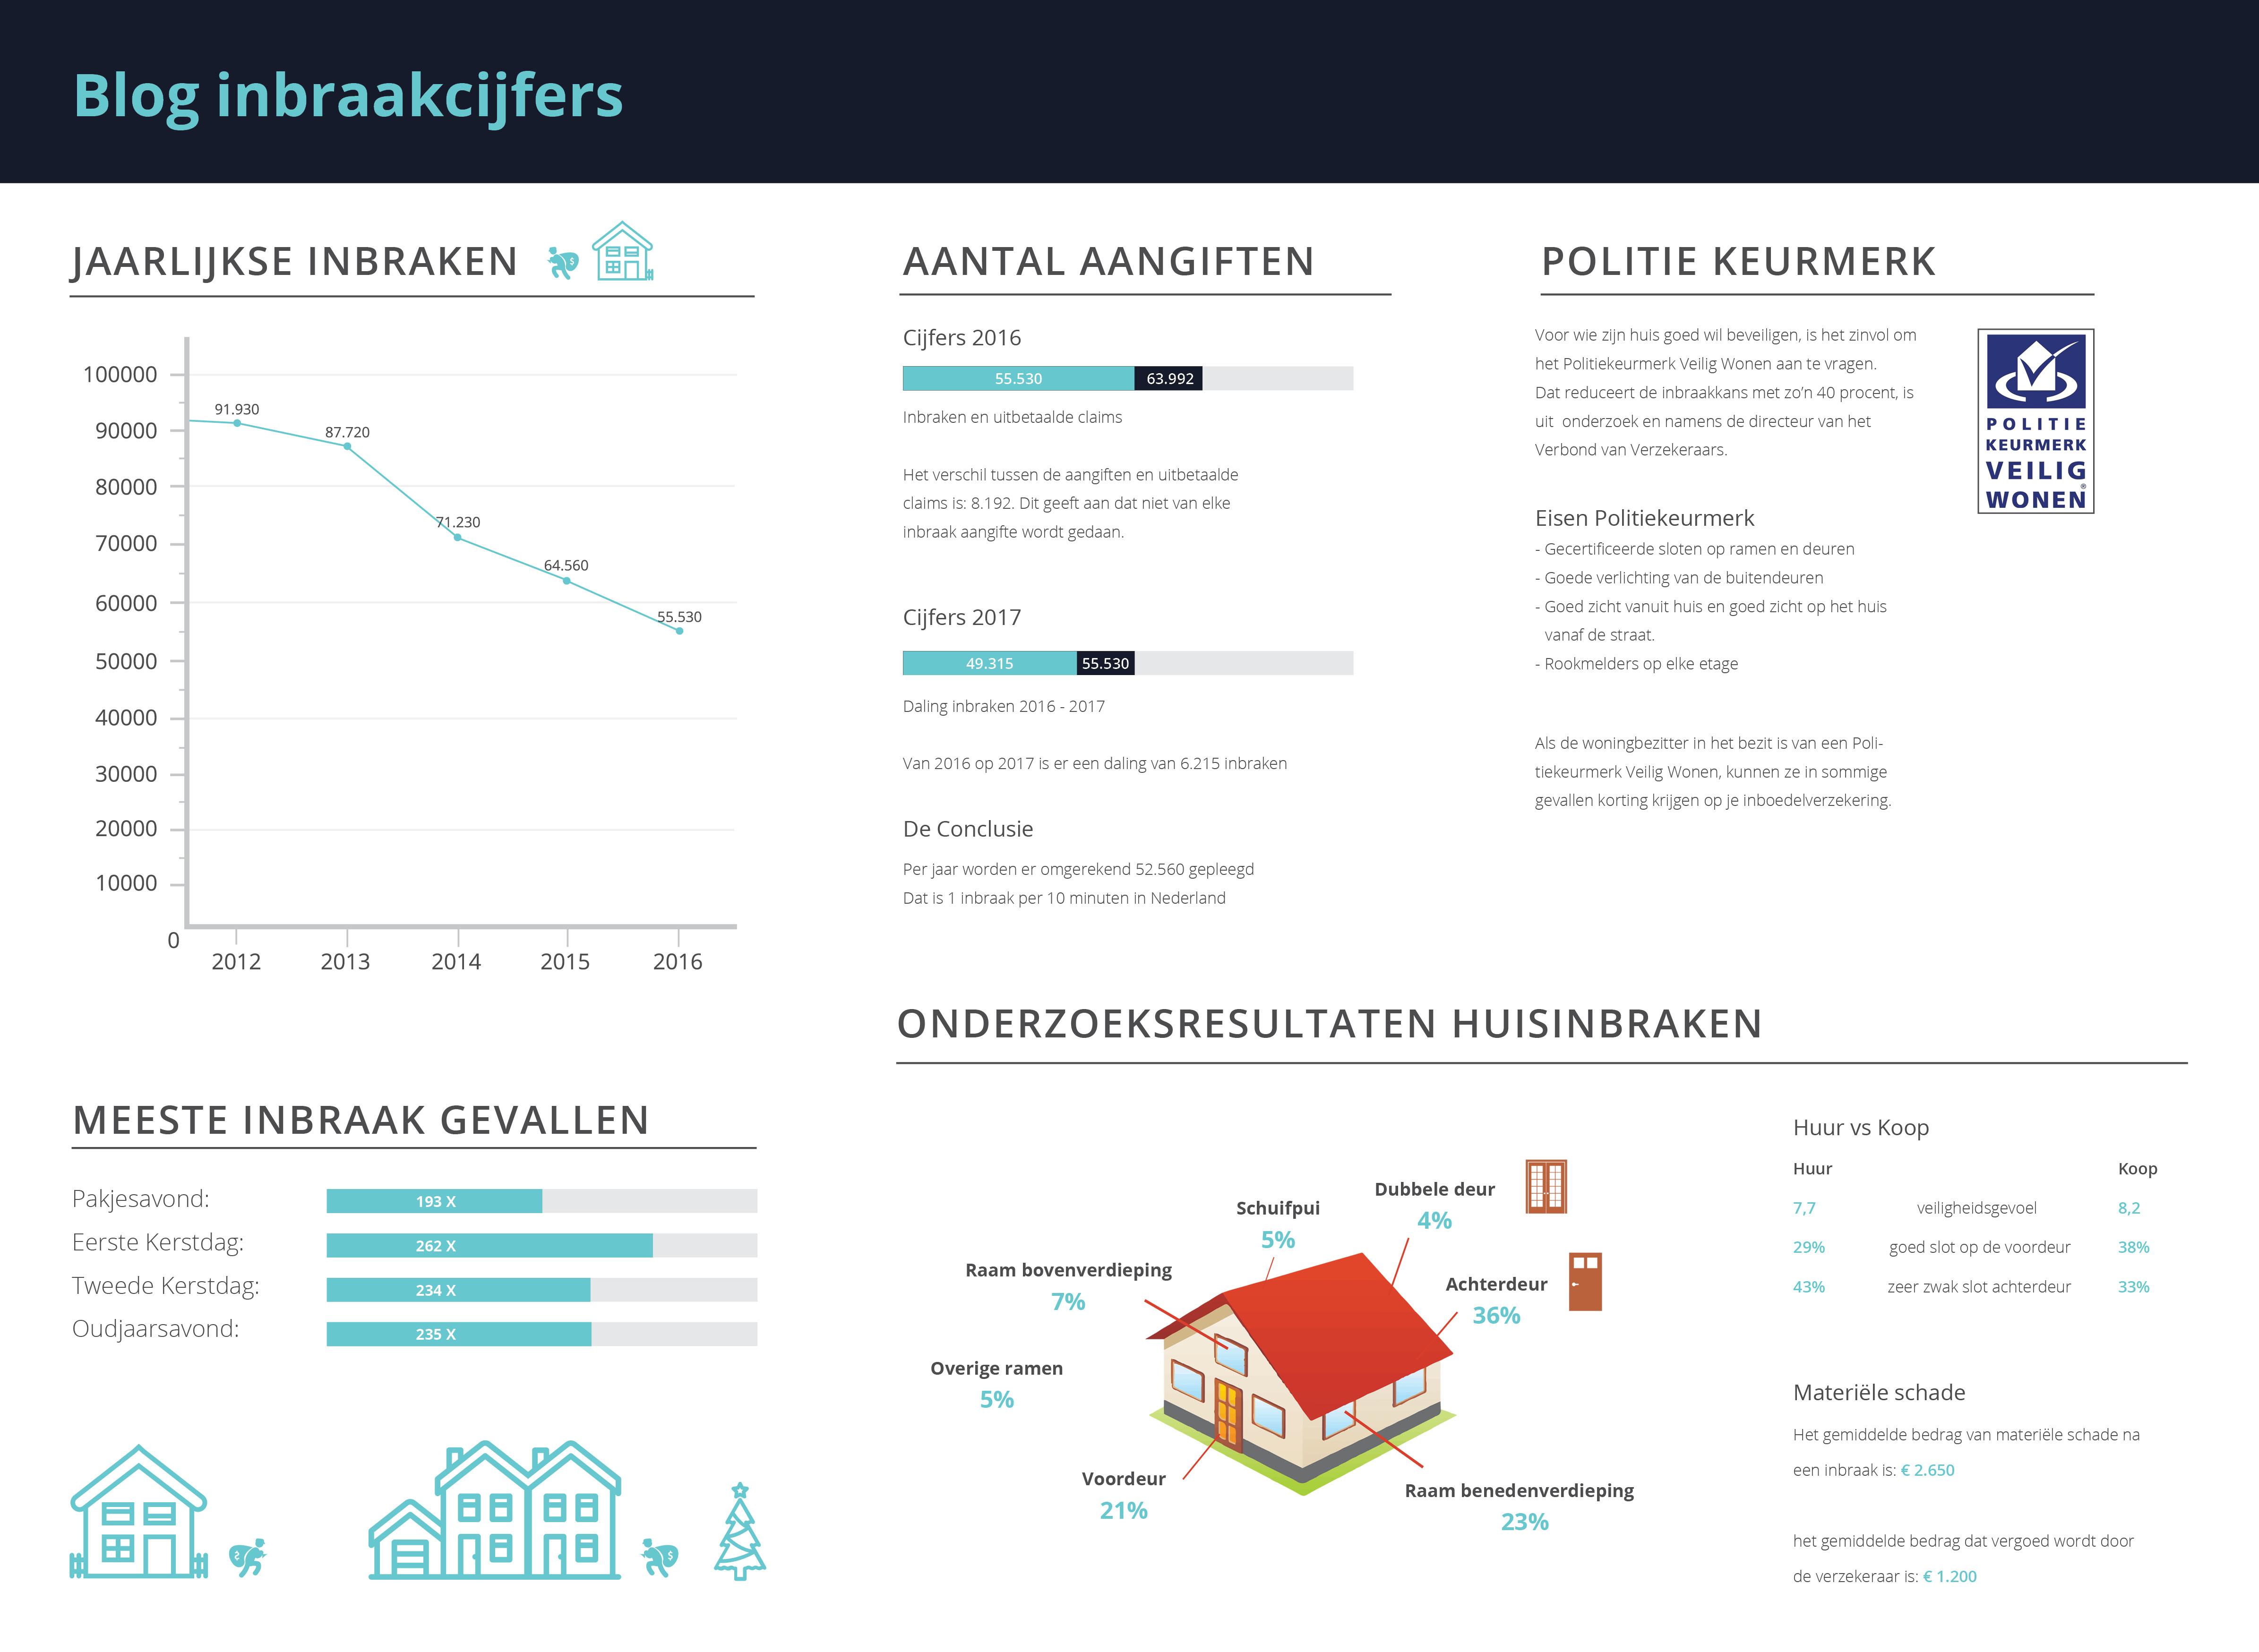 Inbraakcijfers Nederland 2018